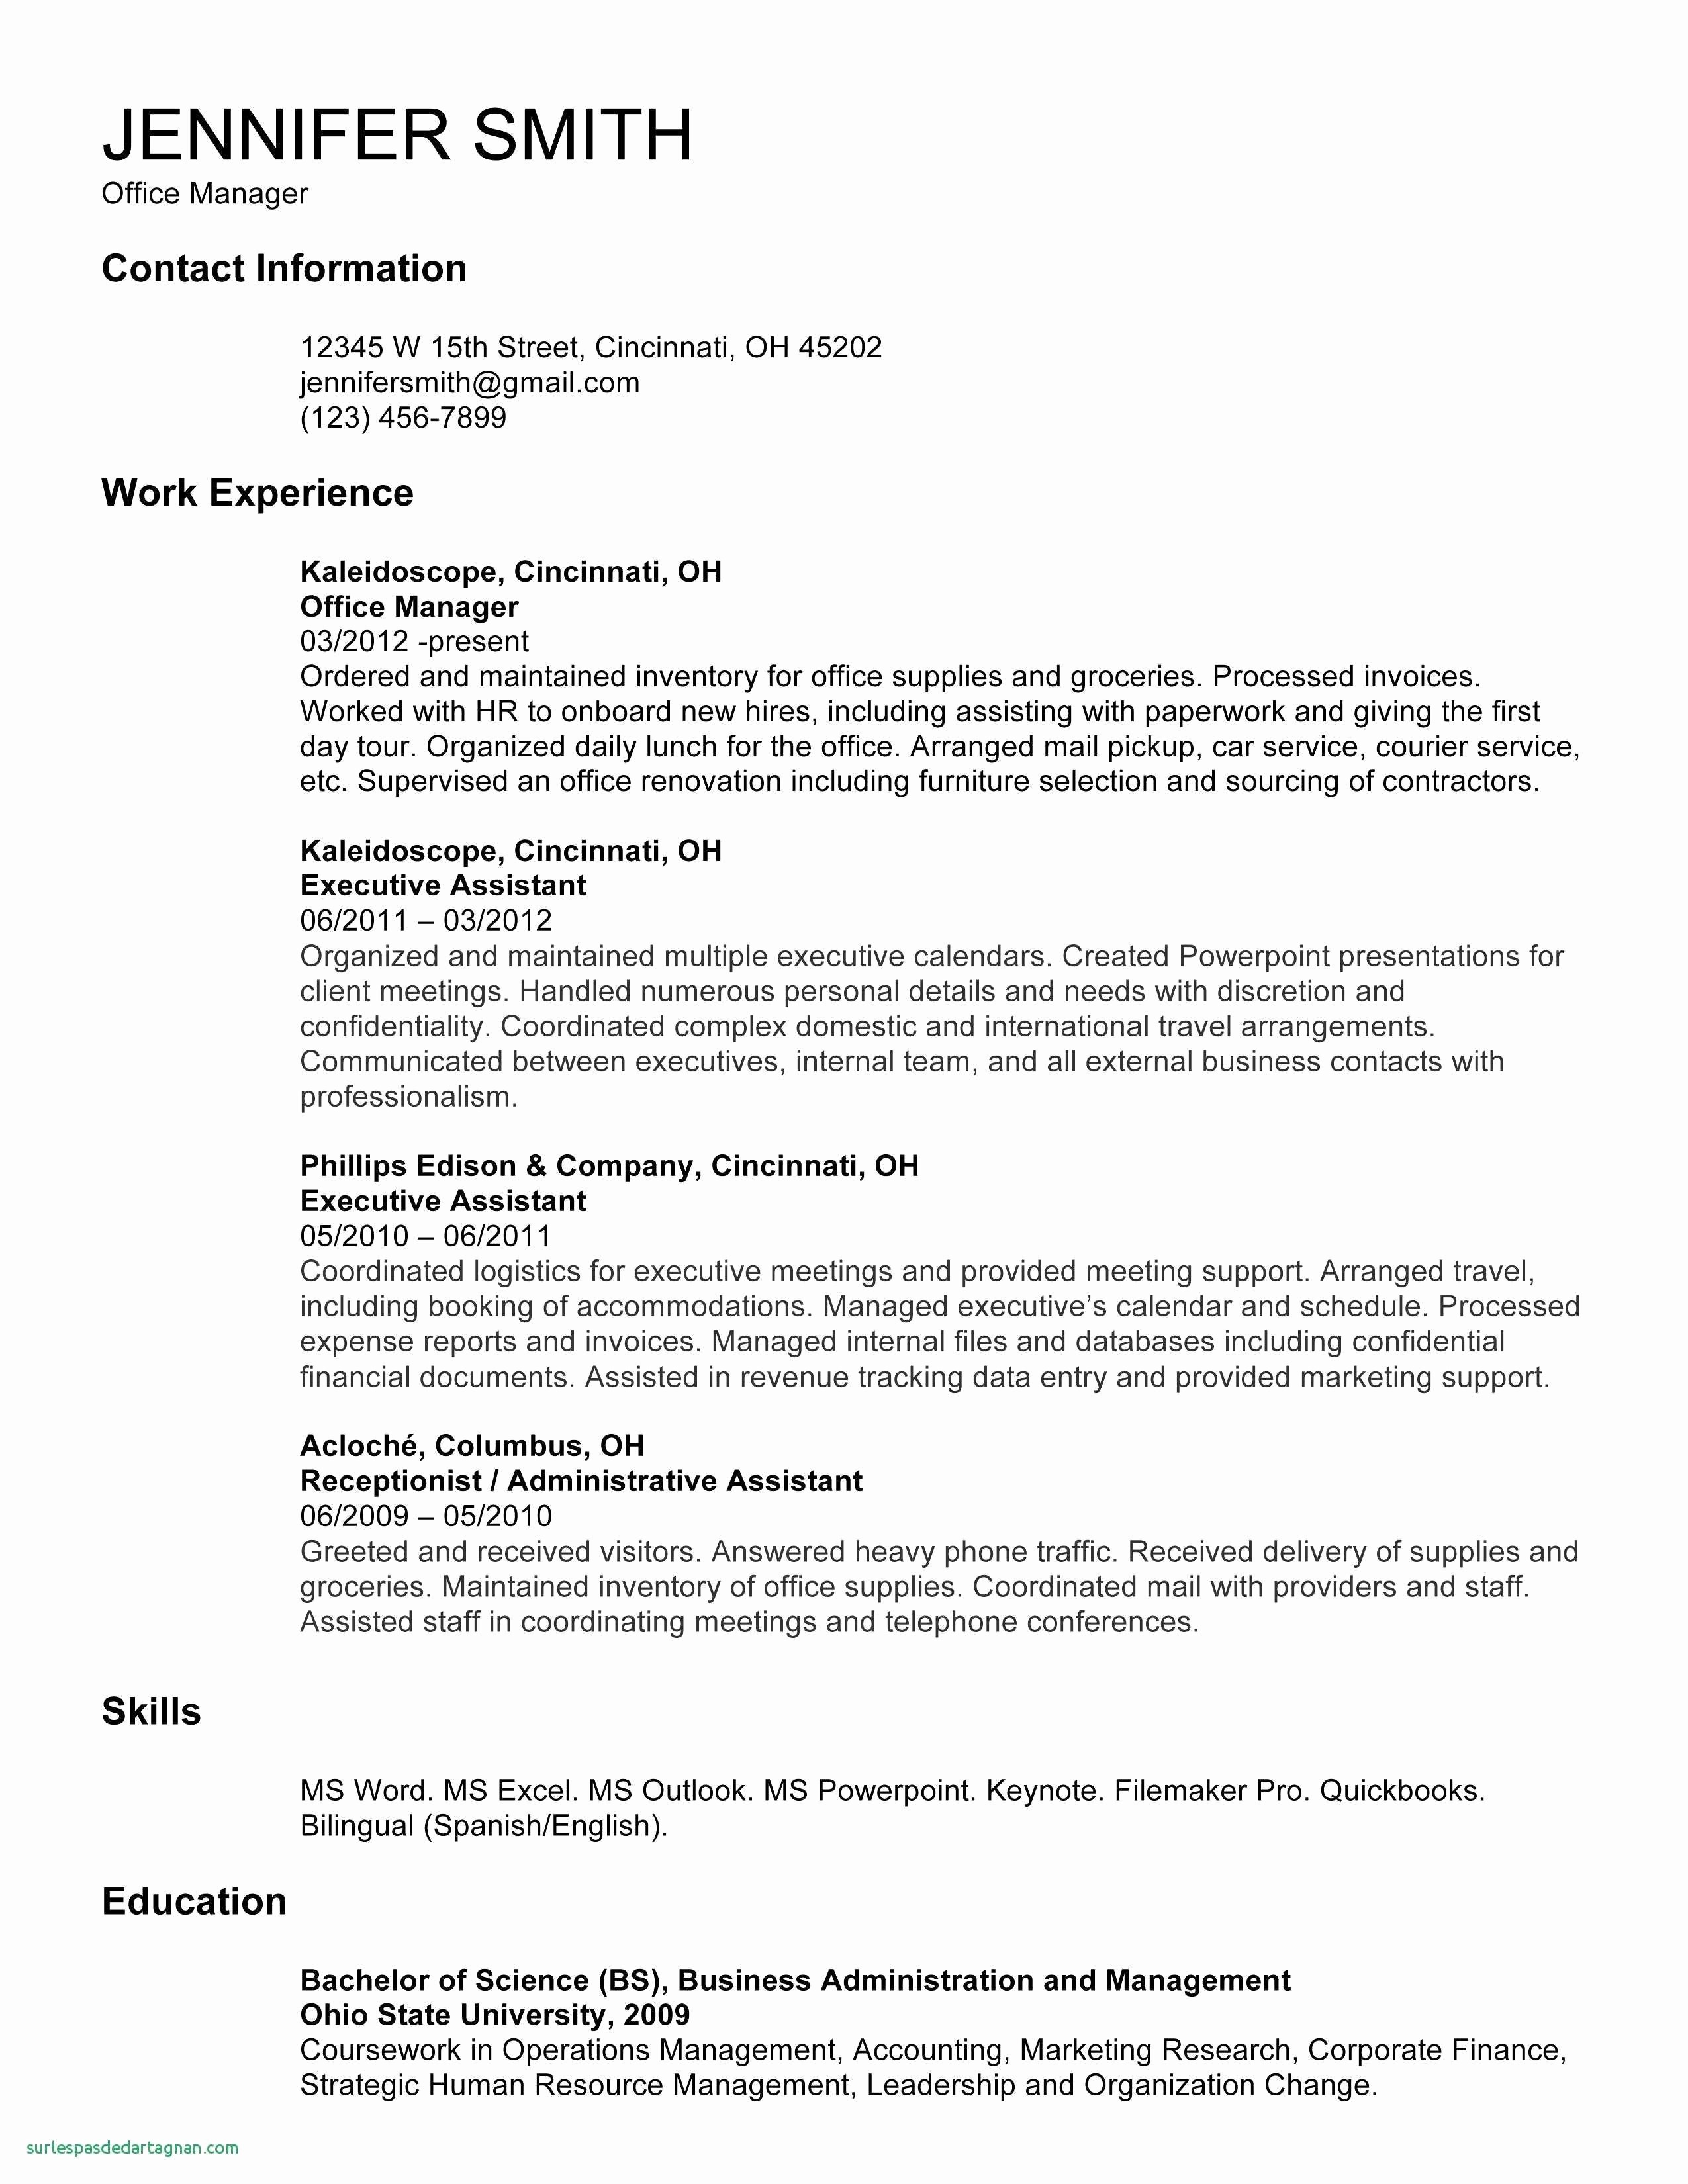 Microsoft Resume Templates Free Download Fresh Fresh Free Resume Template Microsoft Word